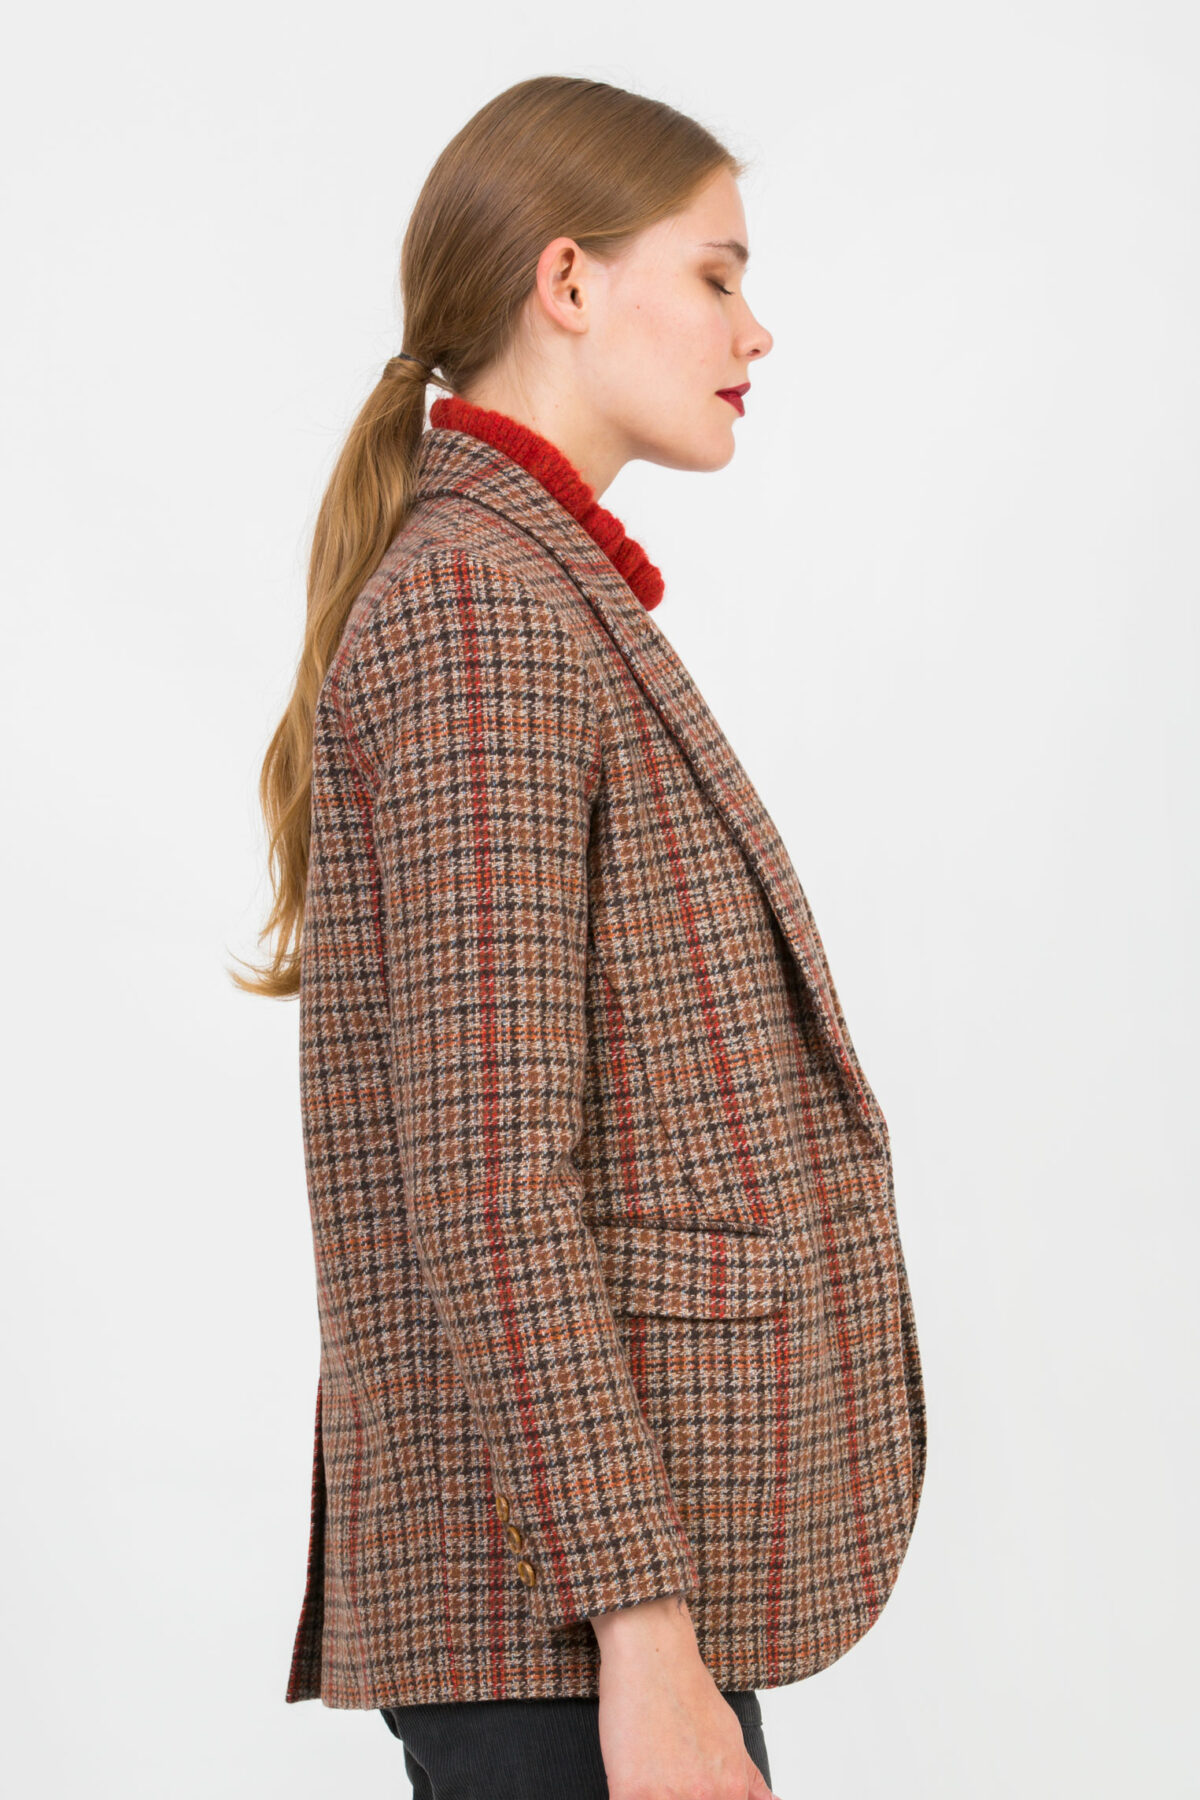 vive-sherlock-brick-checked-jacket-lapetite-francaise-matchboxathens